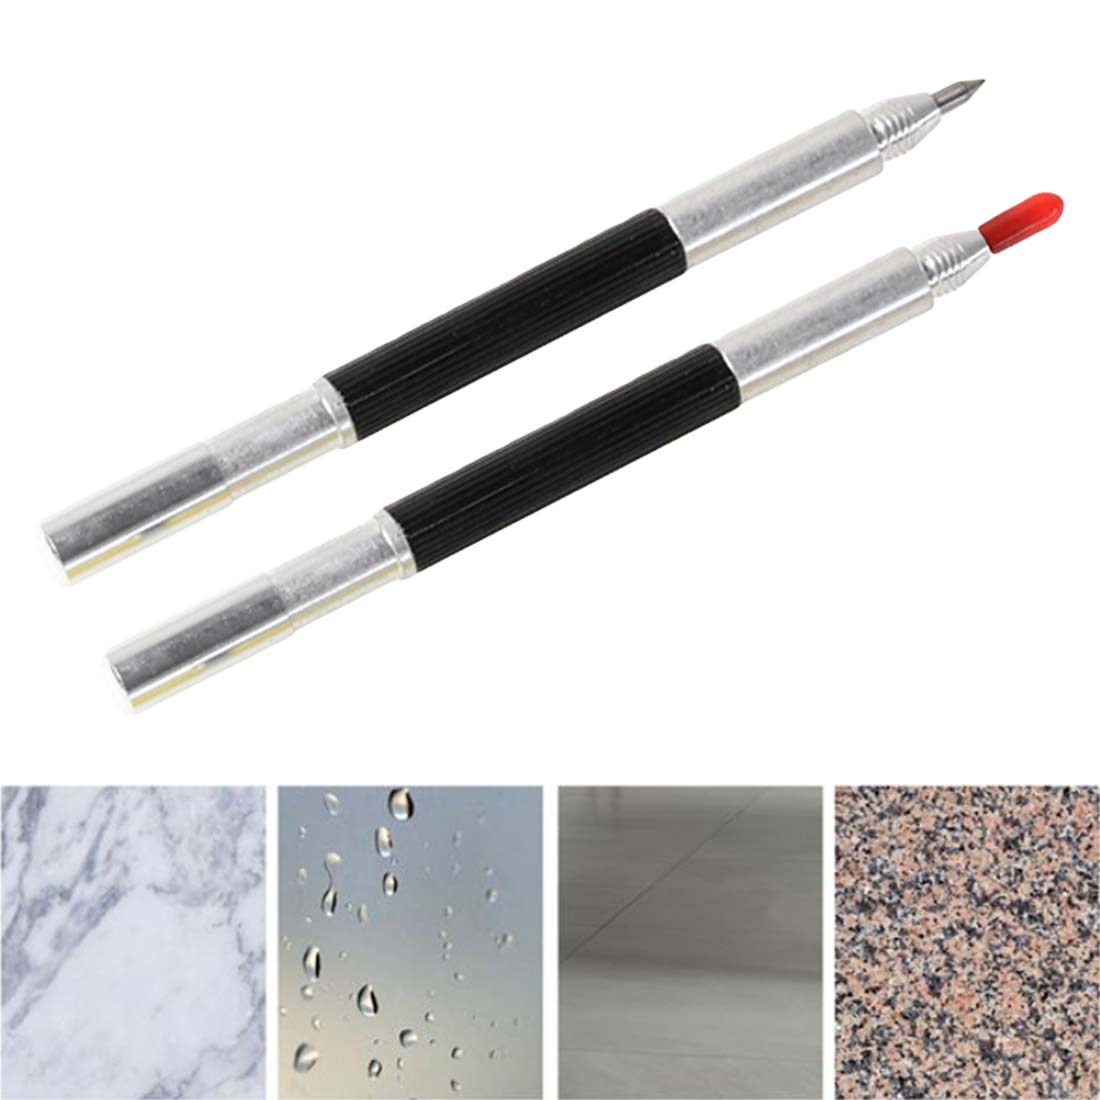 Handle Tipped Glass Tile Cutter Carbide Scriber Hard Metal Tile Cutting Machine Lettering Pen Engraver Glass Knife Scriber